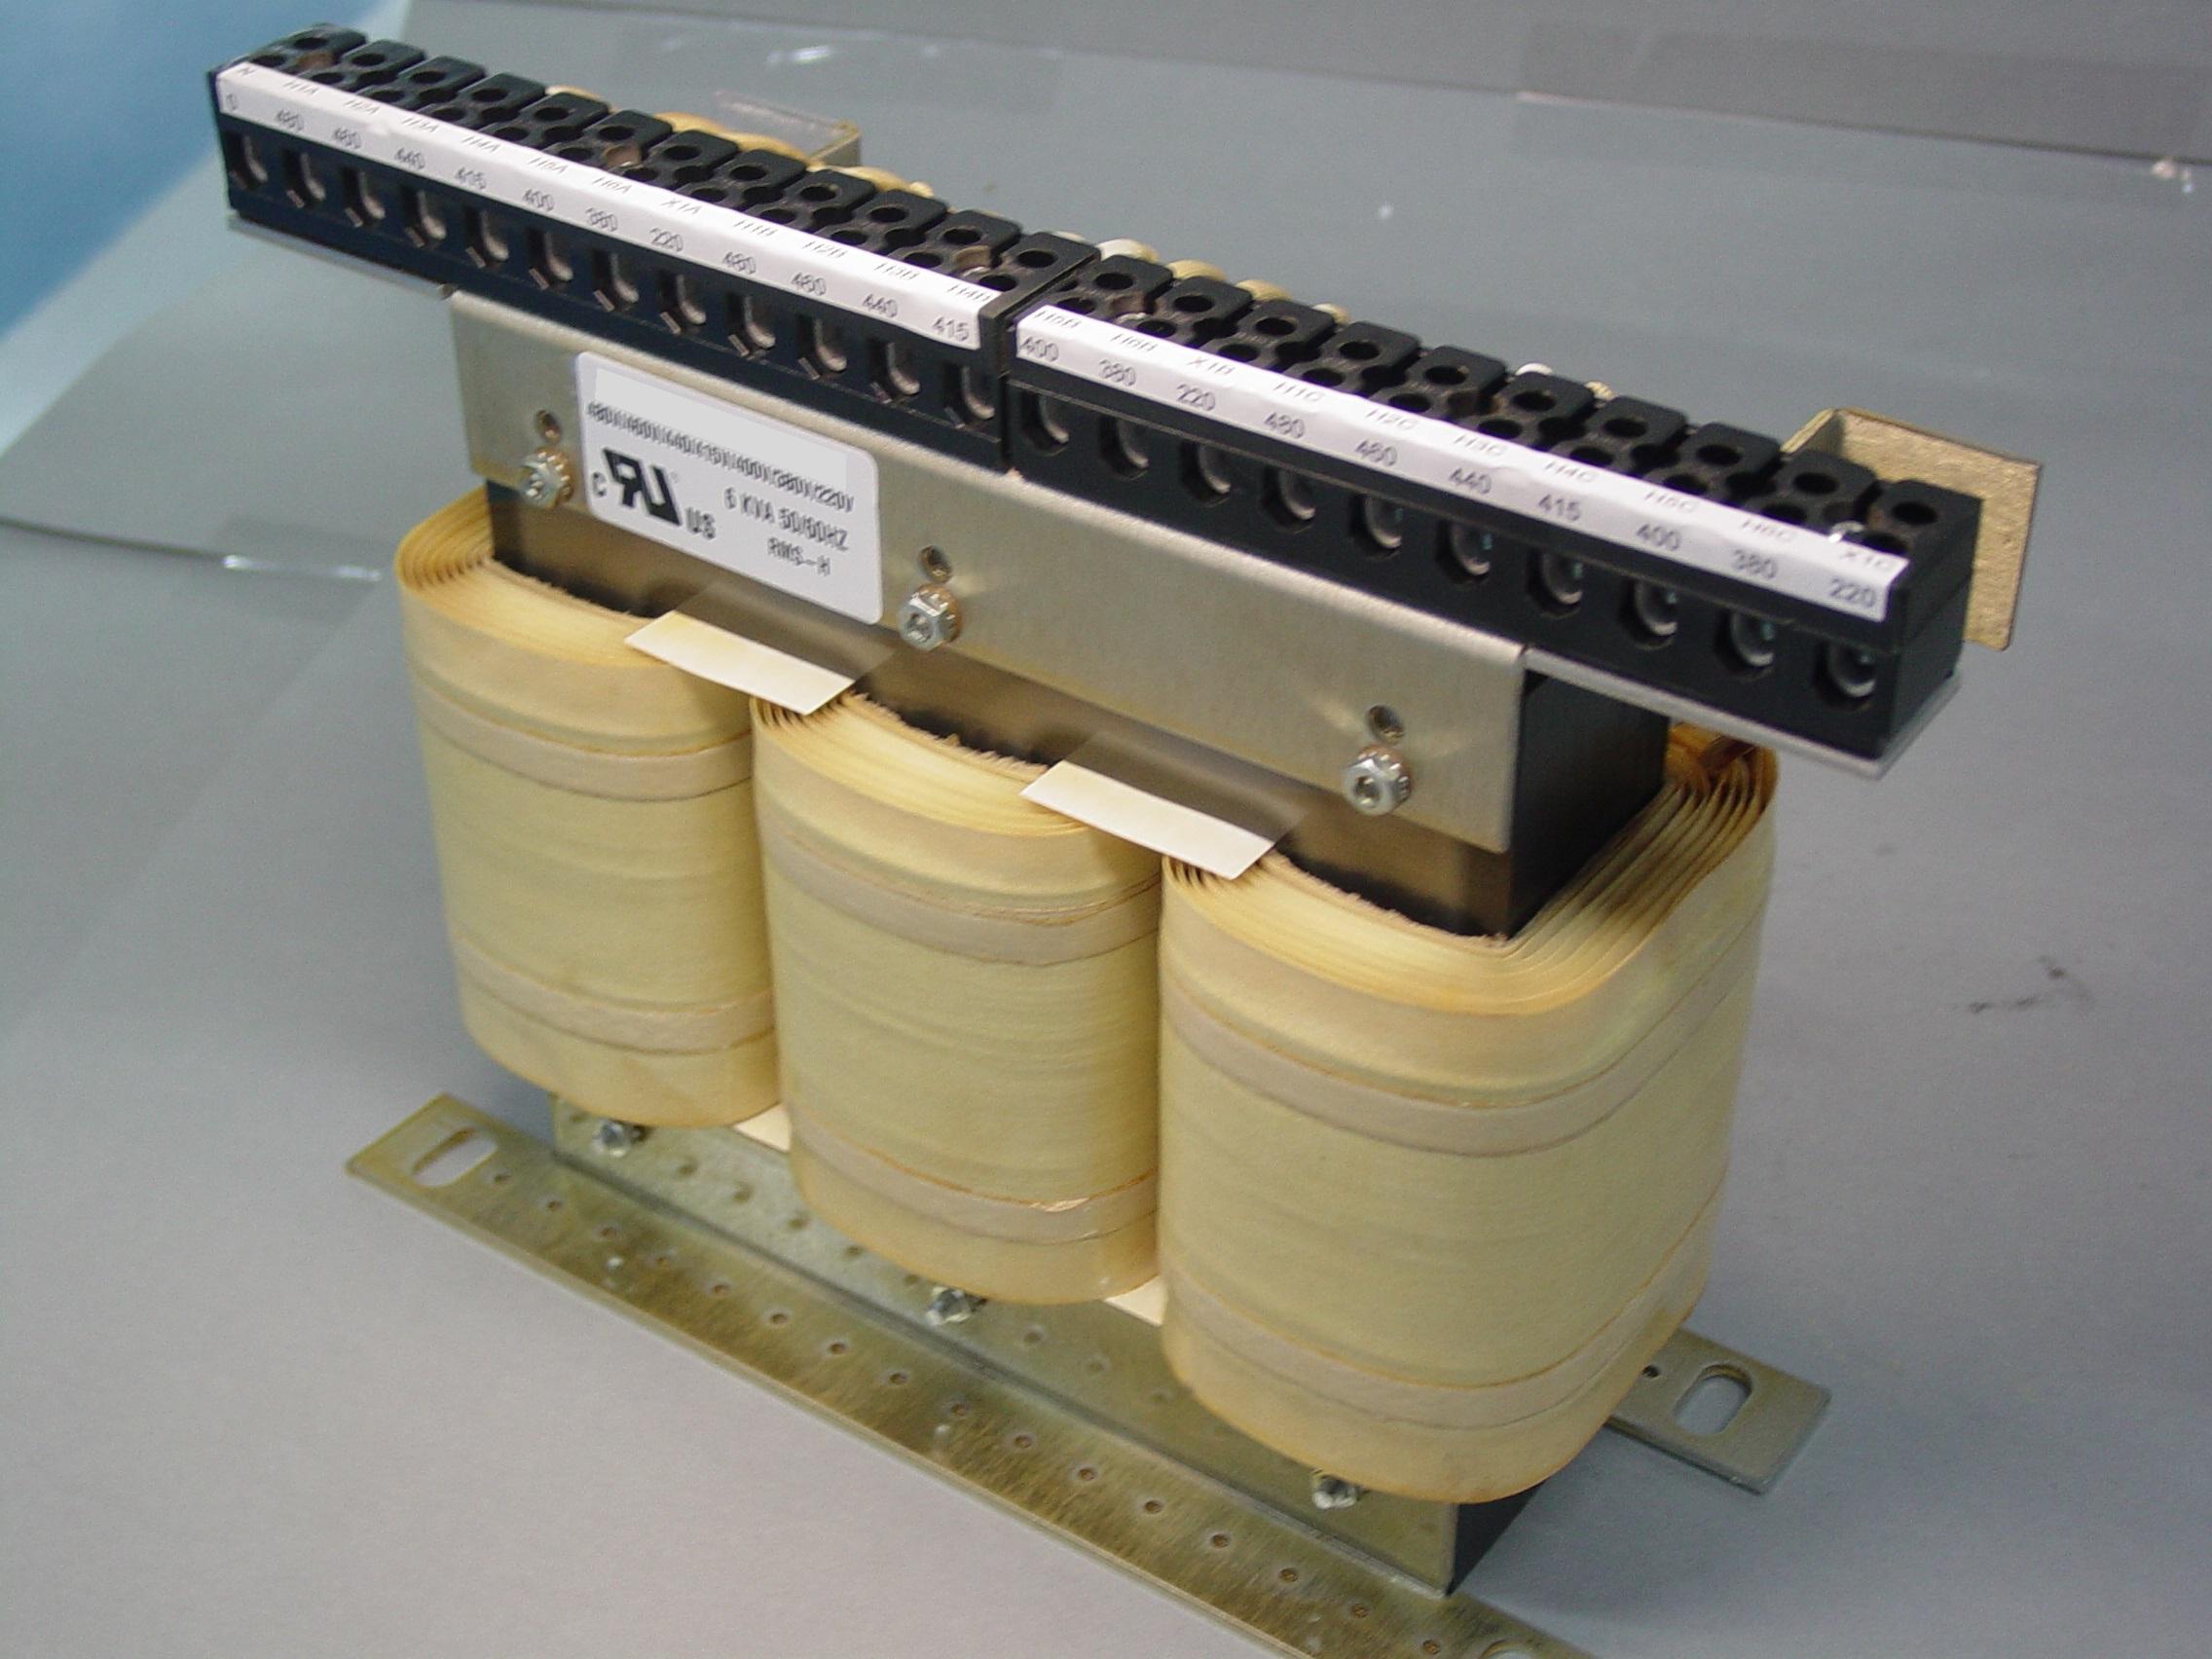 3 phase autotransformer wiring diagram 2006 chevy silverado bose radio auto transformer 220v to 440 volt kva